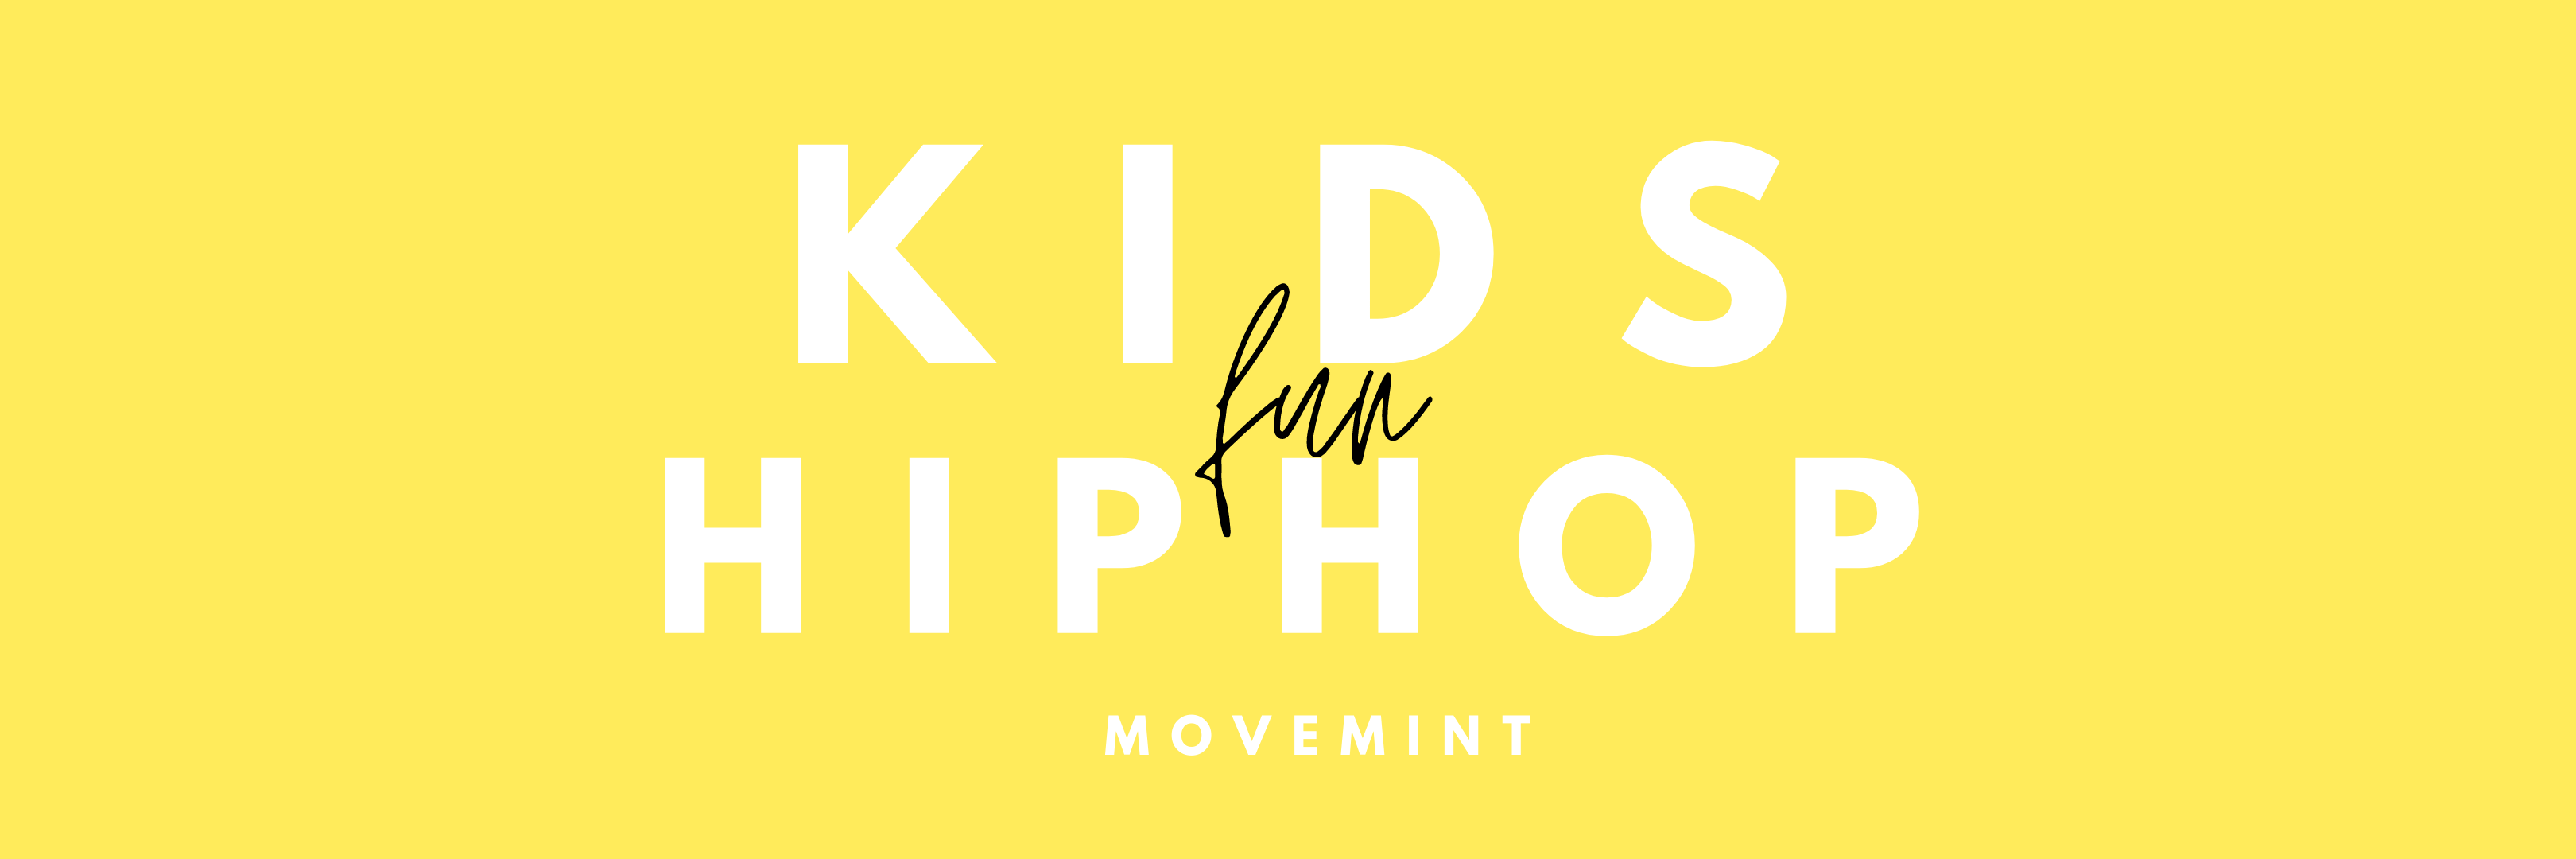 KIDS HIPHOP